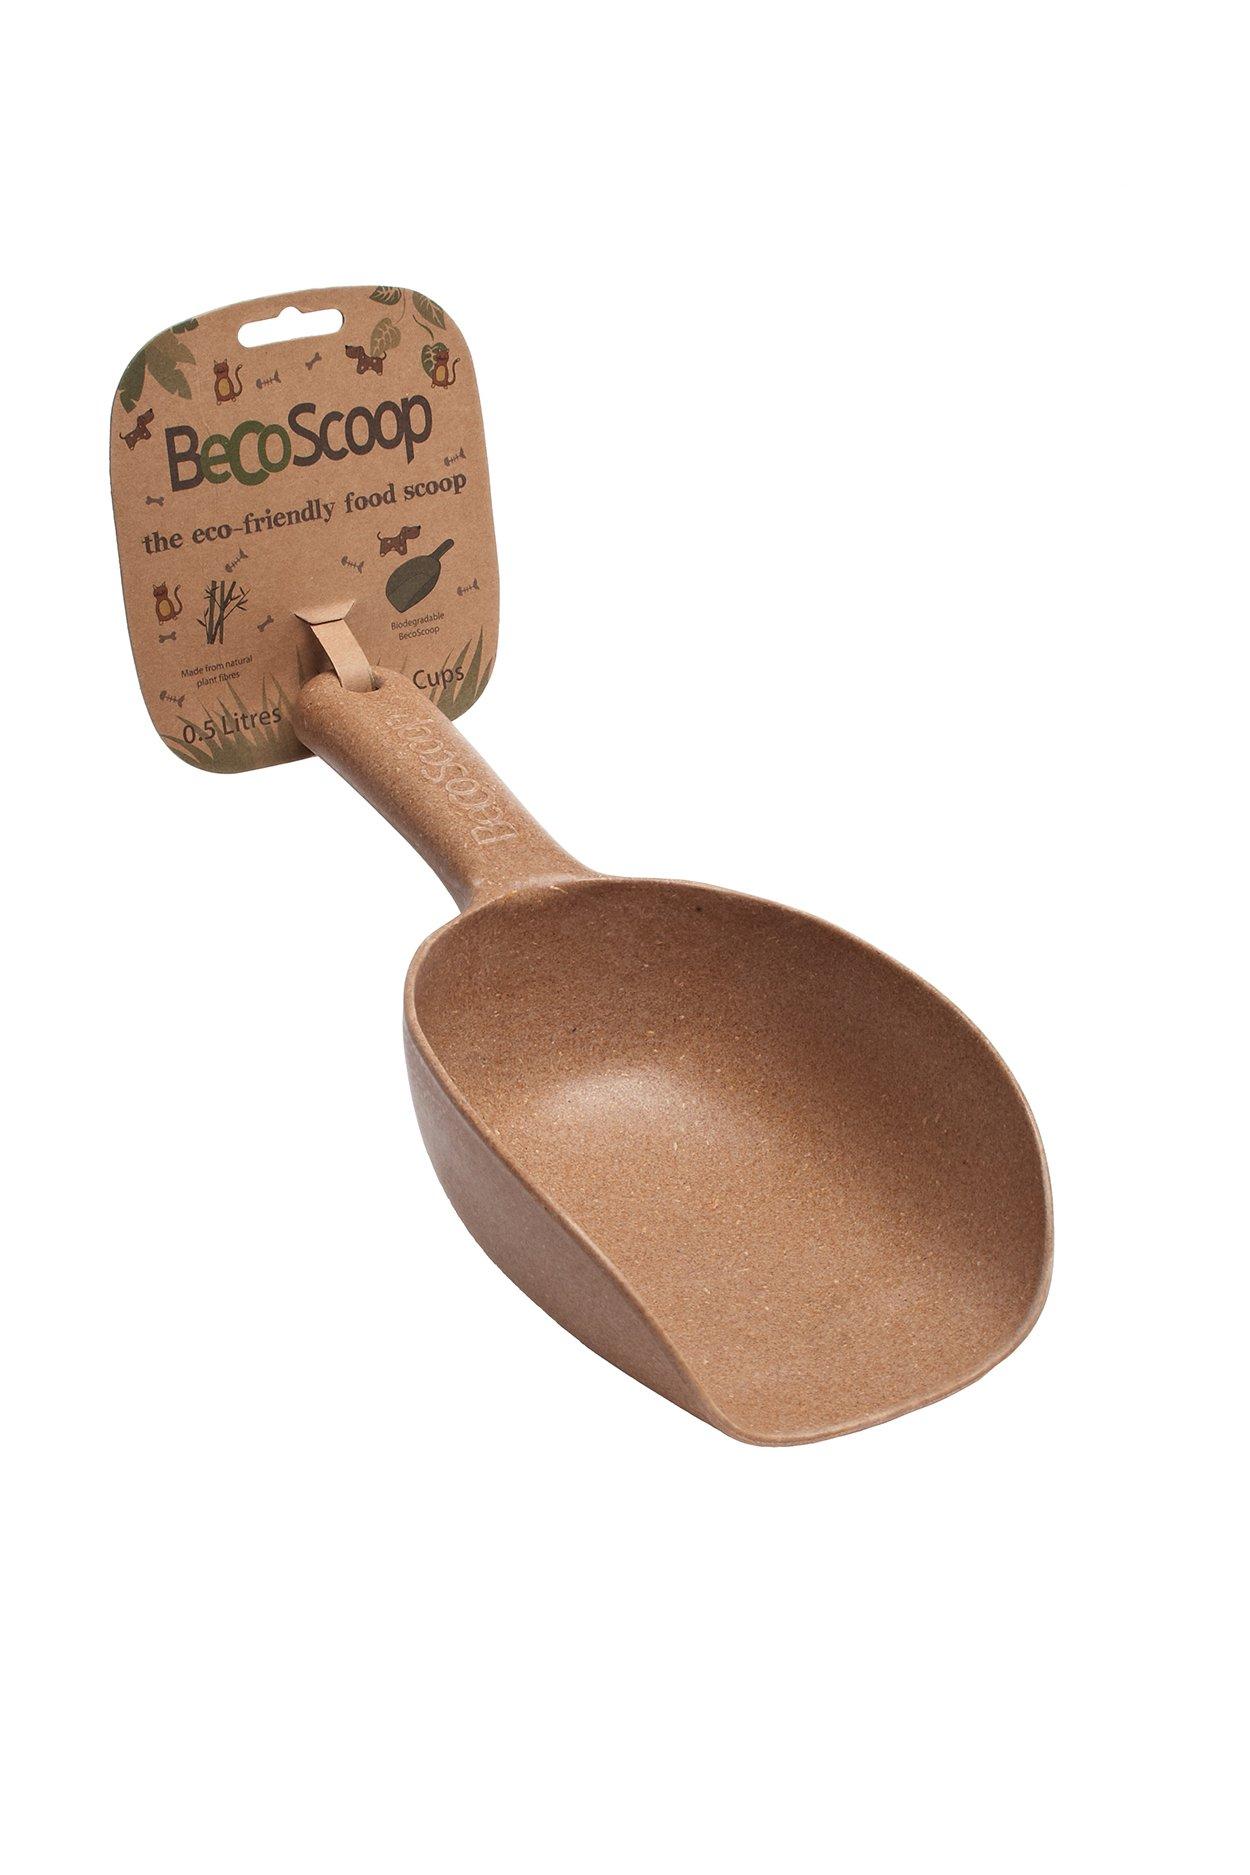 Lopatka na jídlo, BecoScoop-brown, EKO